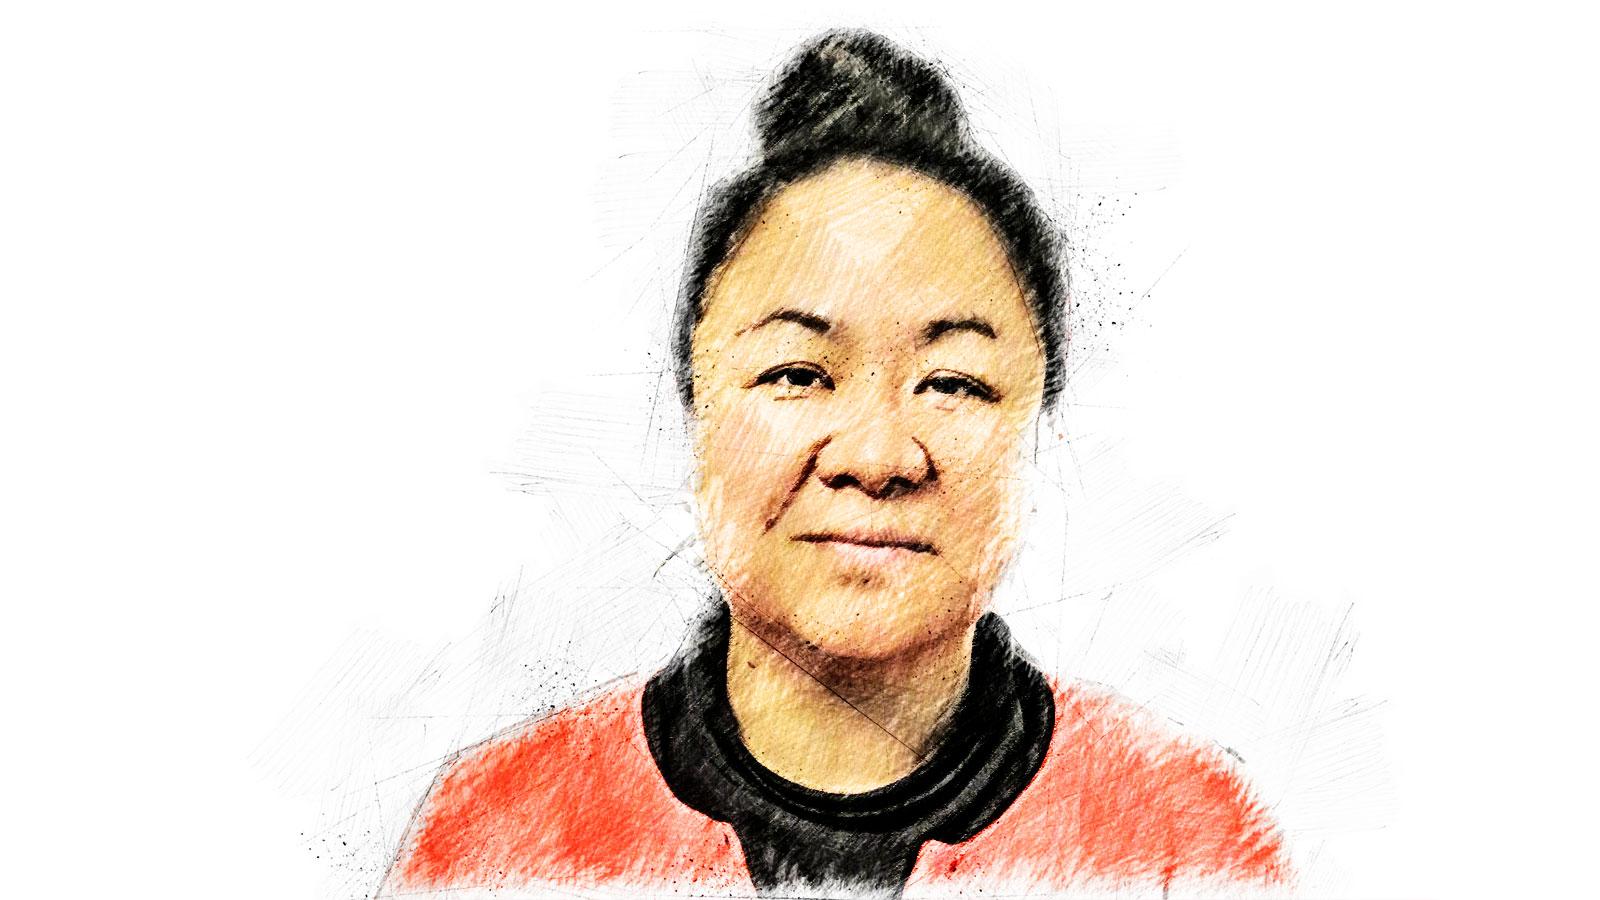 Kimiko Suda, Sinologin, Wissenschaftlerin, Asien, Rassismus, Asiaten